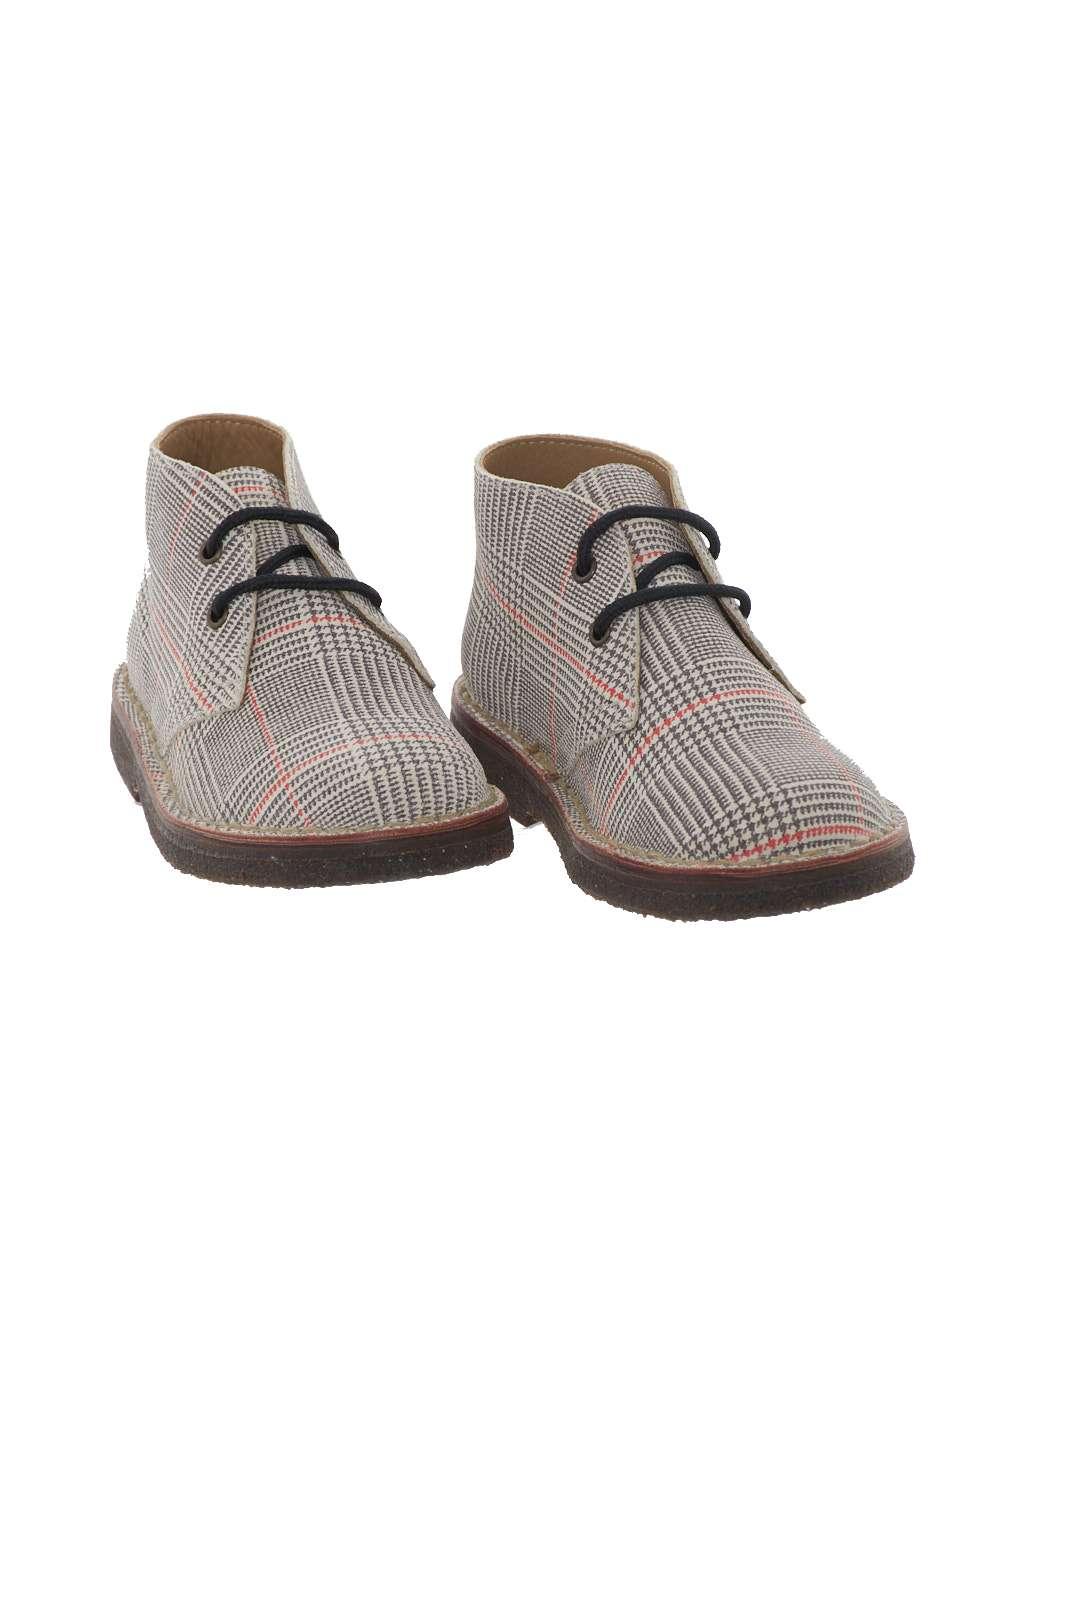 https://www.parmax.com/media/catalog/product/P/E/PE-outlet_parmax-scarpa-bambino-P_P_-01016-B.jpg